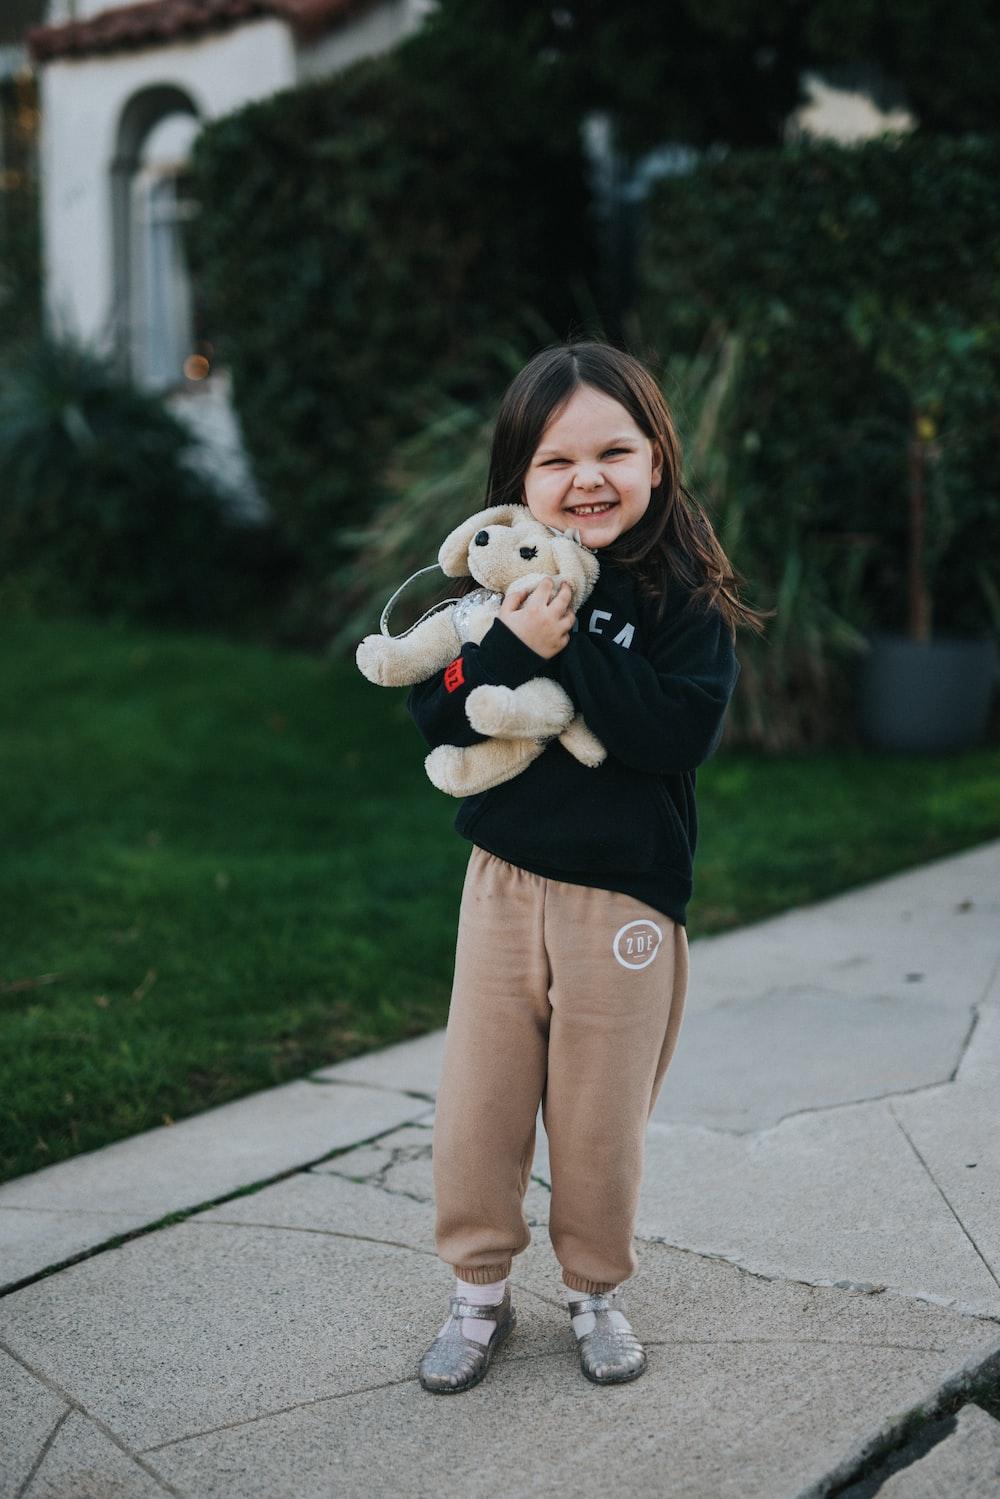 girl in black long sleeve shirt holding white bear plush toy